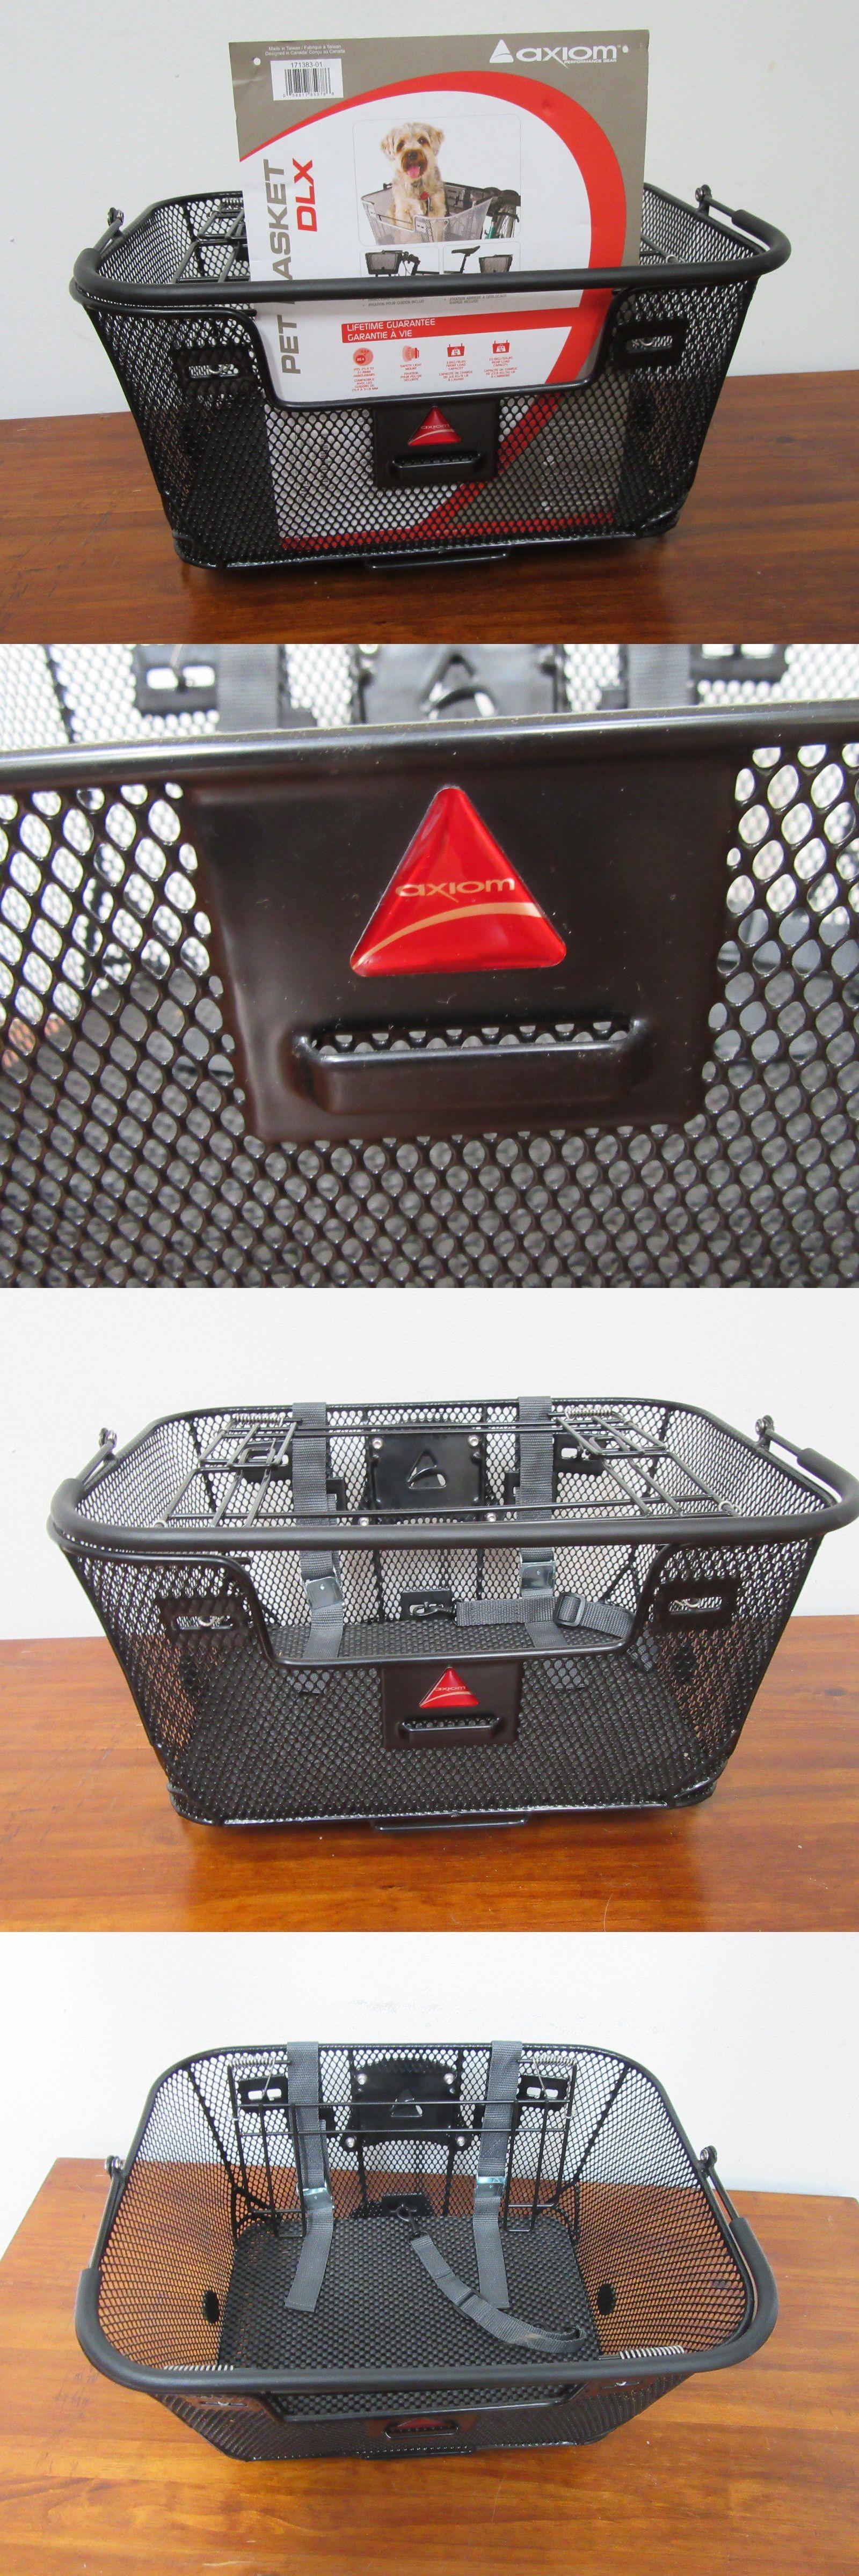 Axiom pet basket with rack and handlebar mounts black premium duel